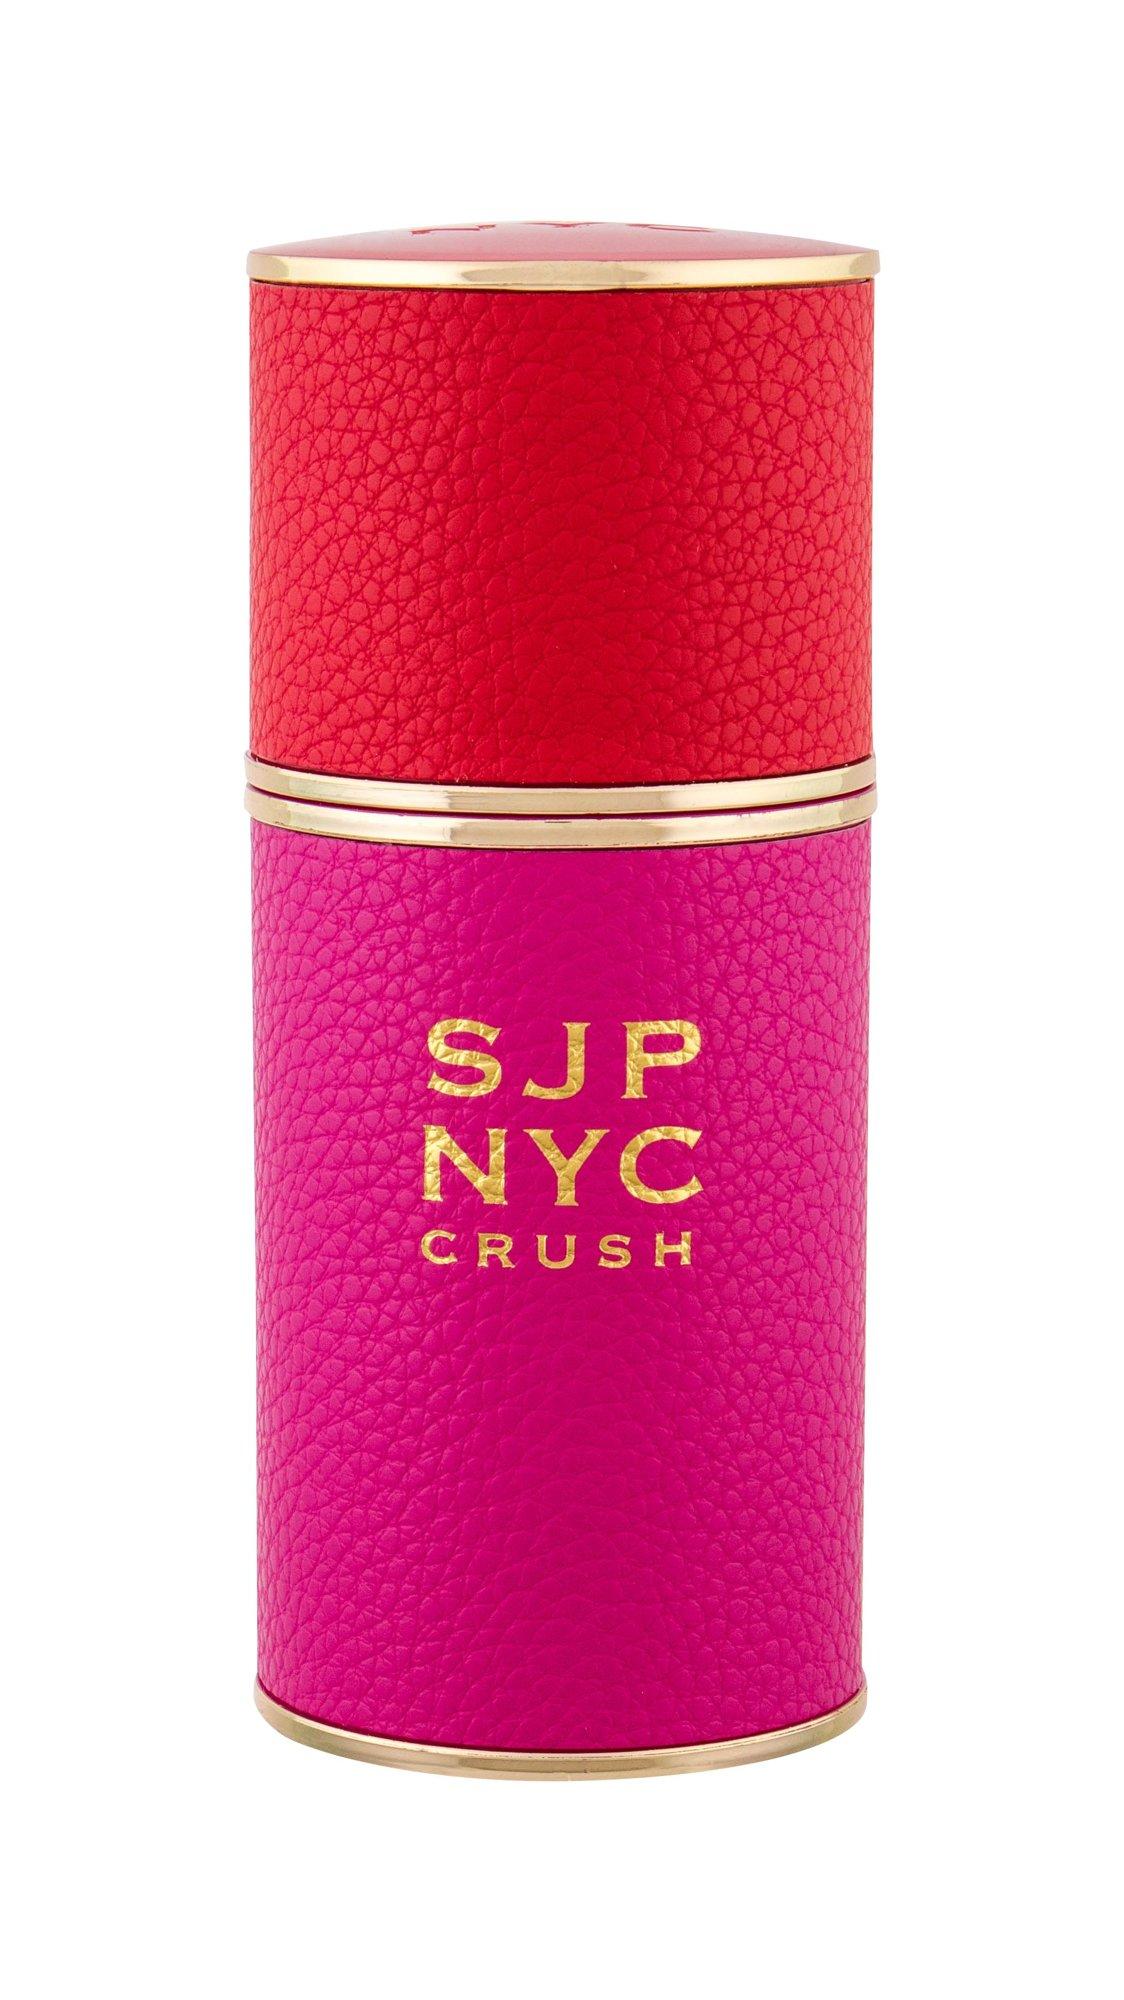 Sarah Jessica Parker SJP NYC Crush Eau de Parfum 100ml